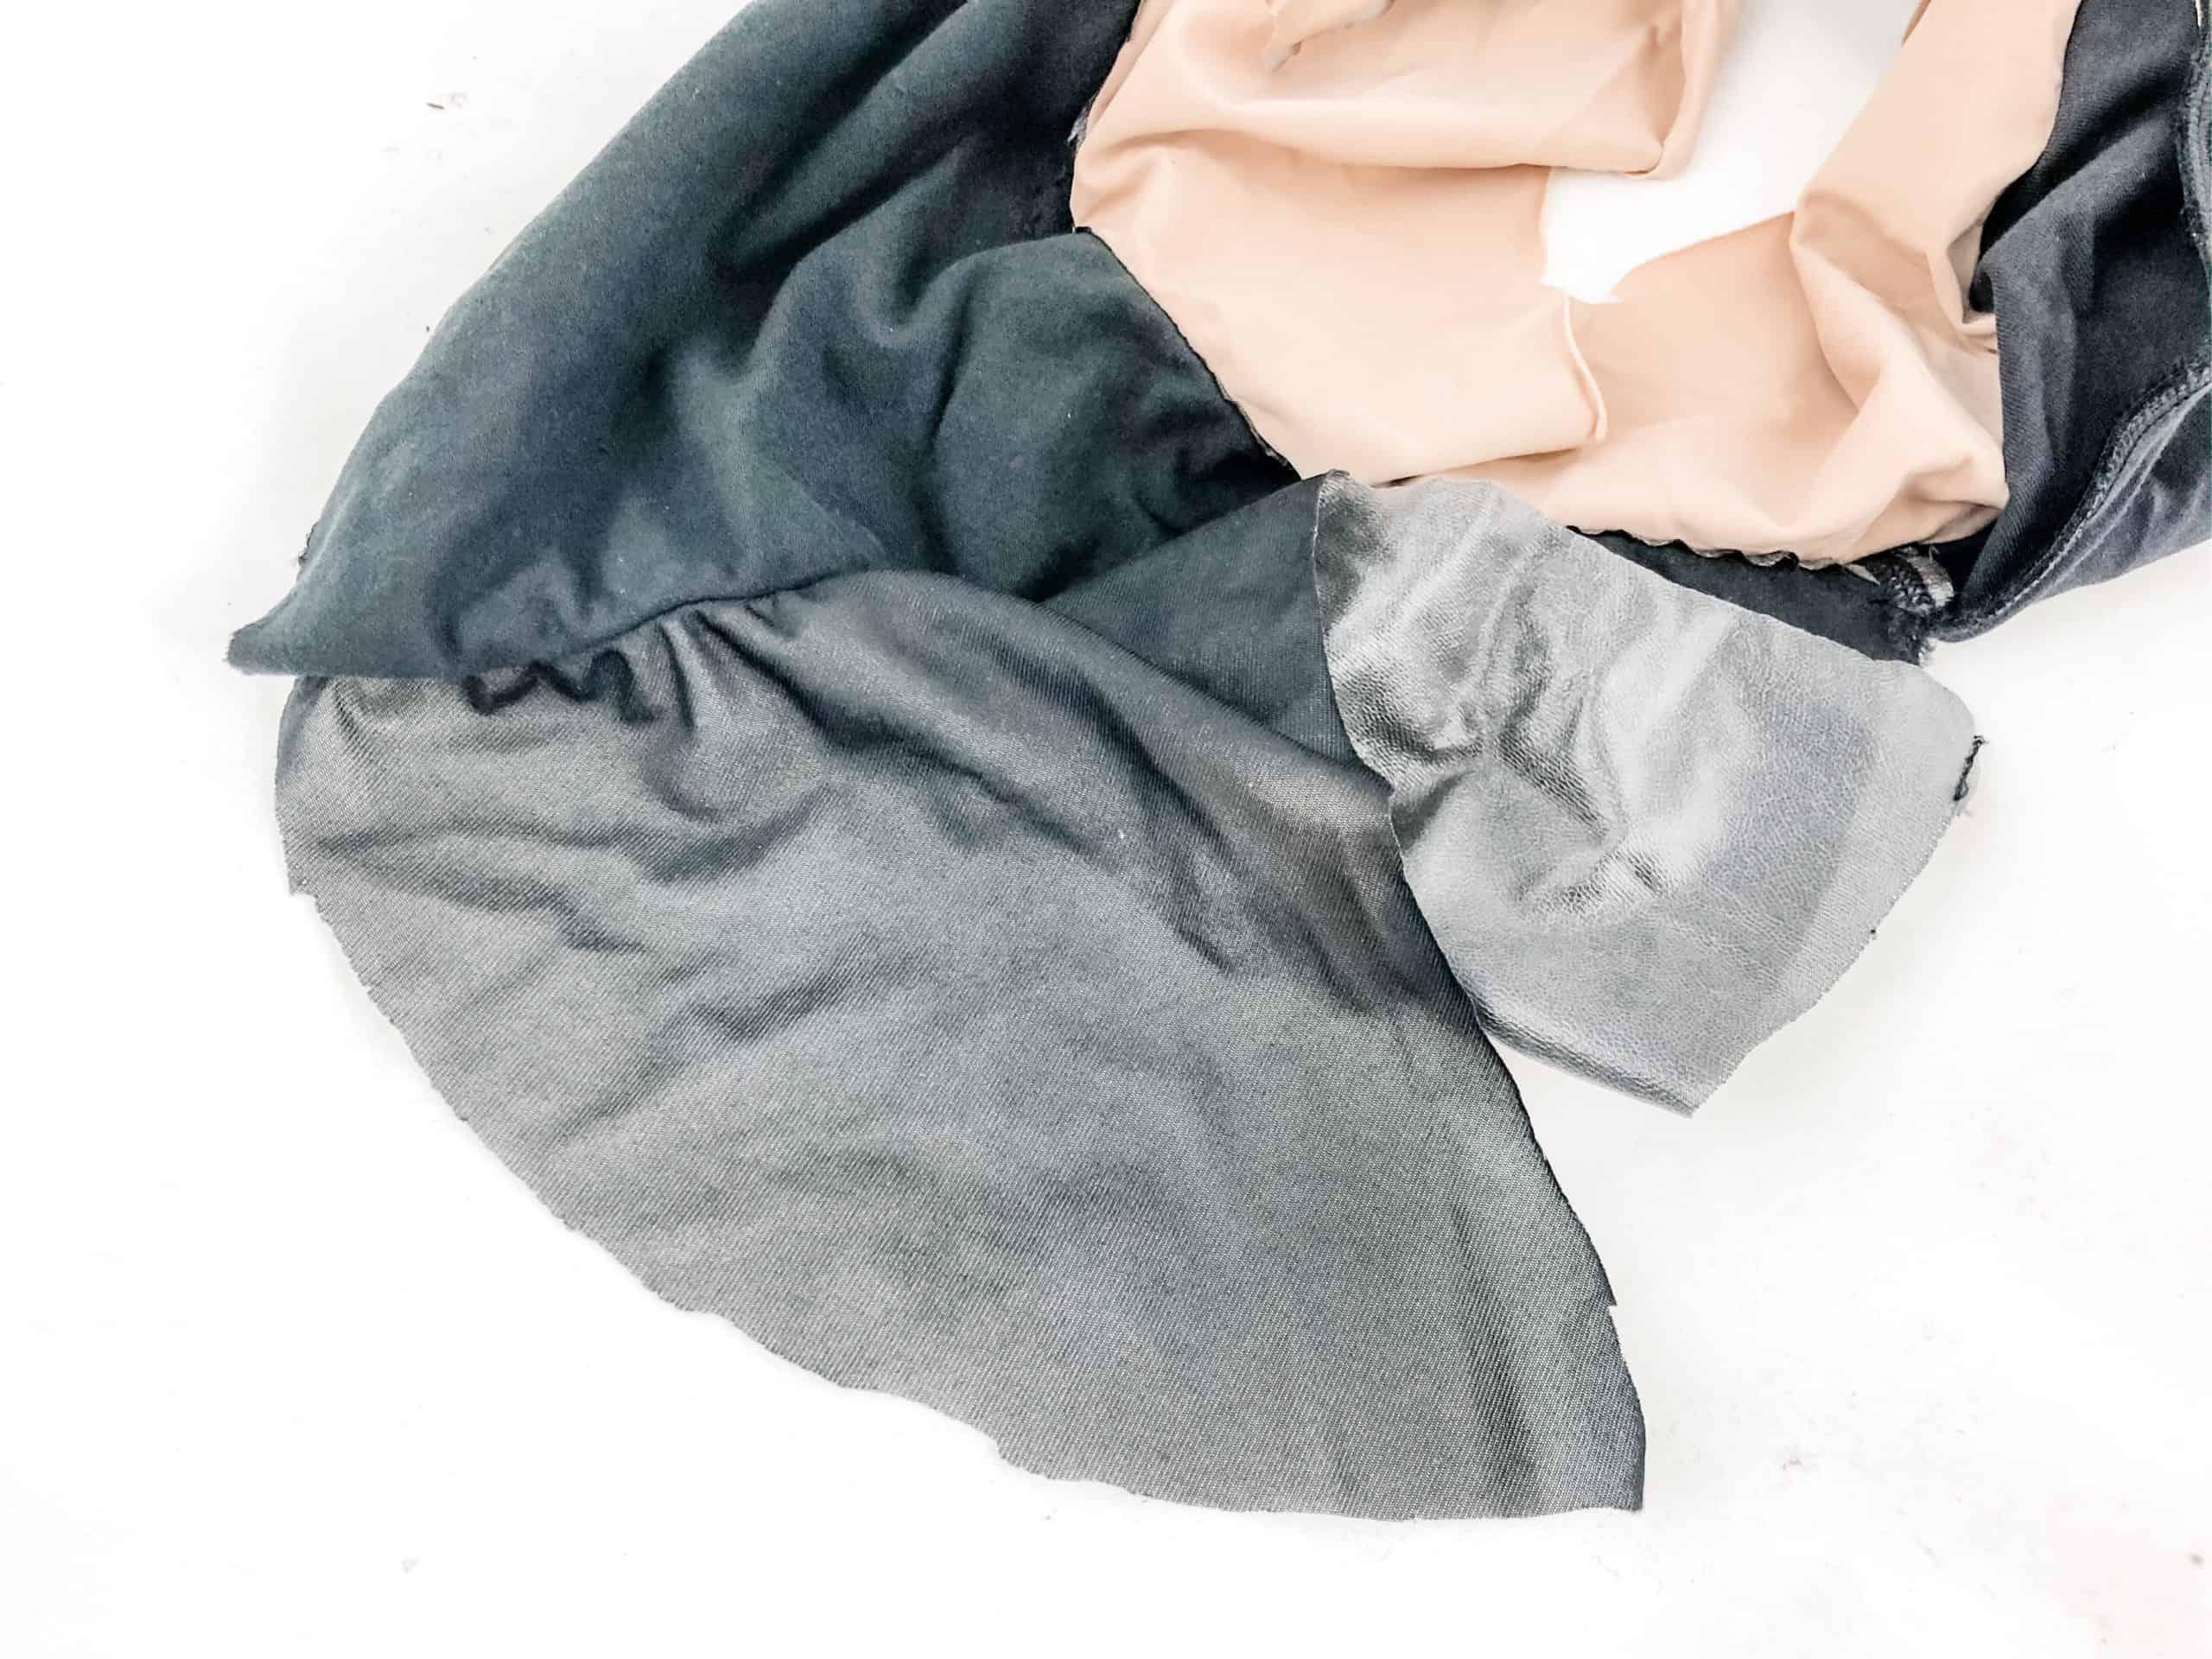 Thinx Period Panties cut apart